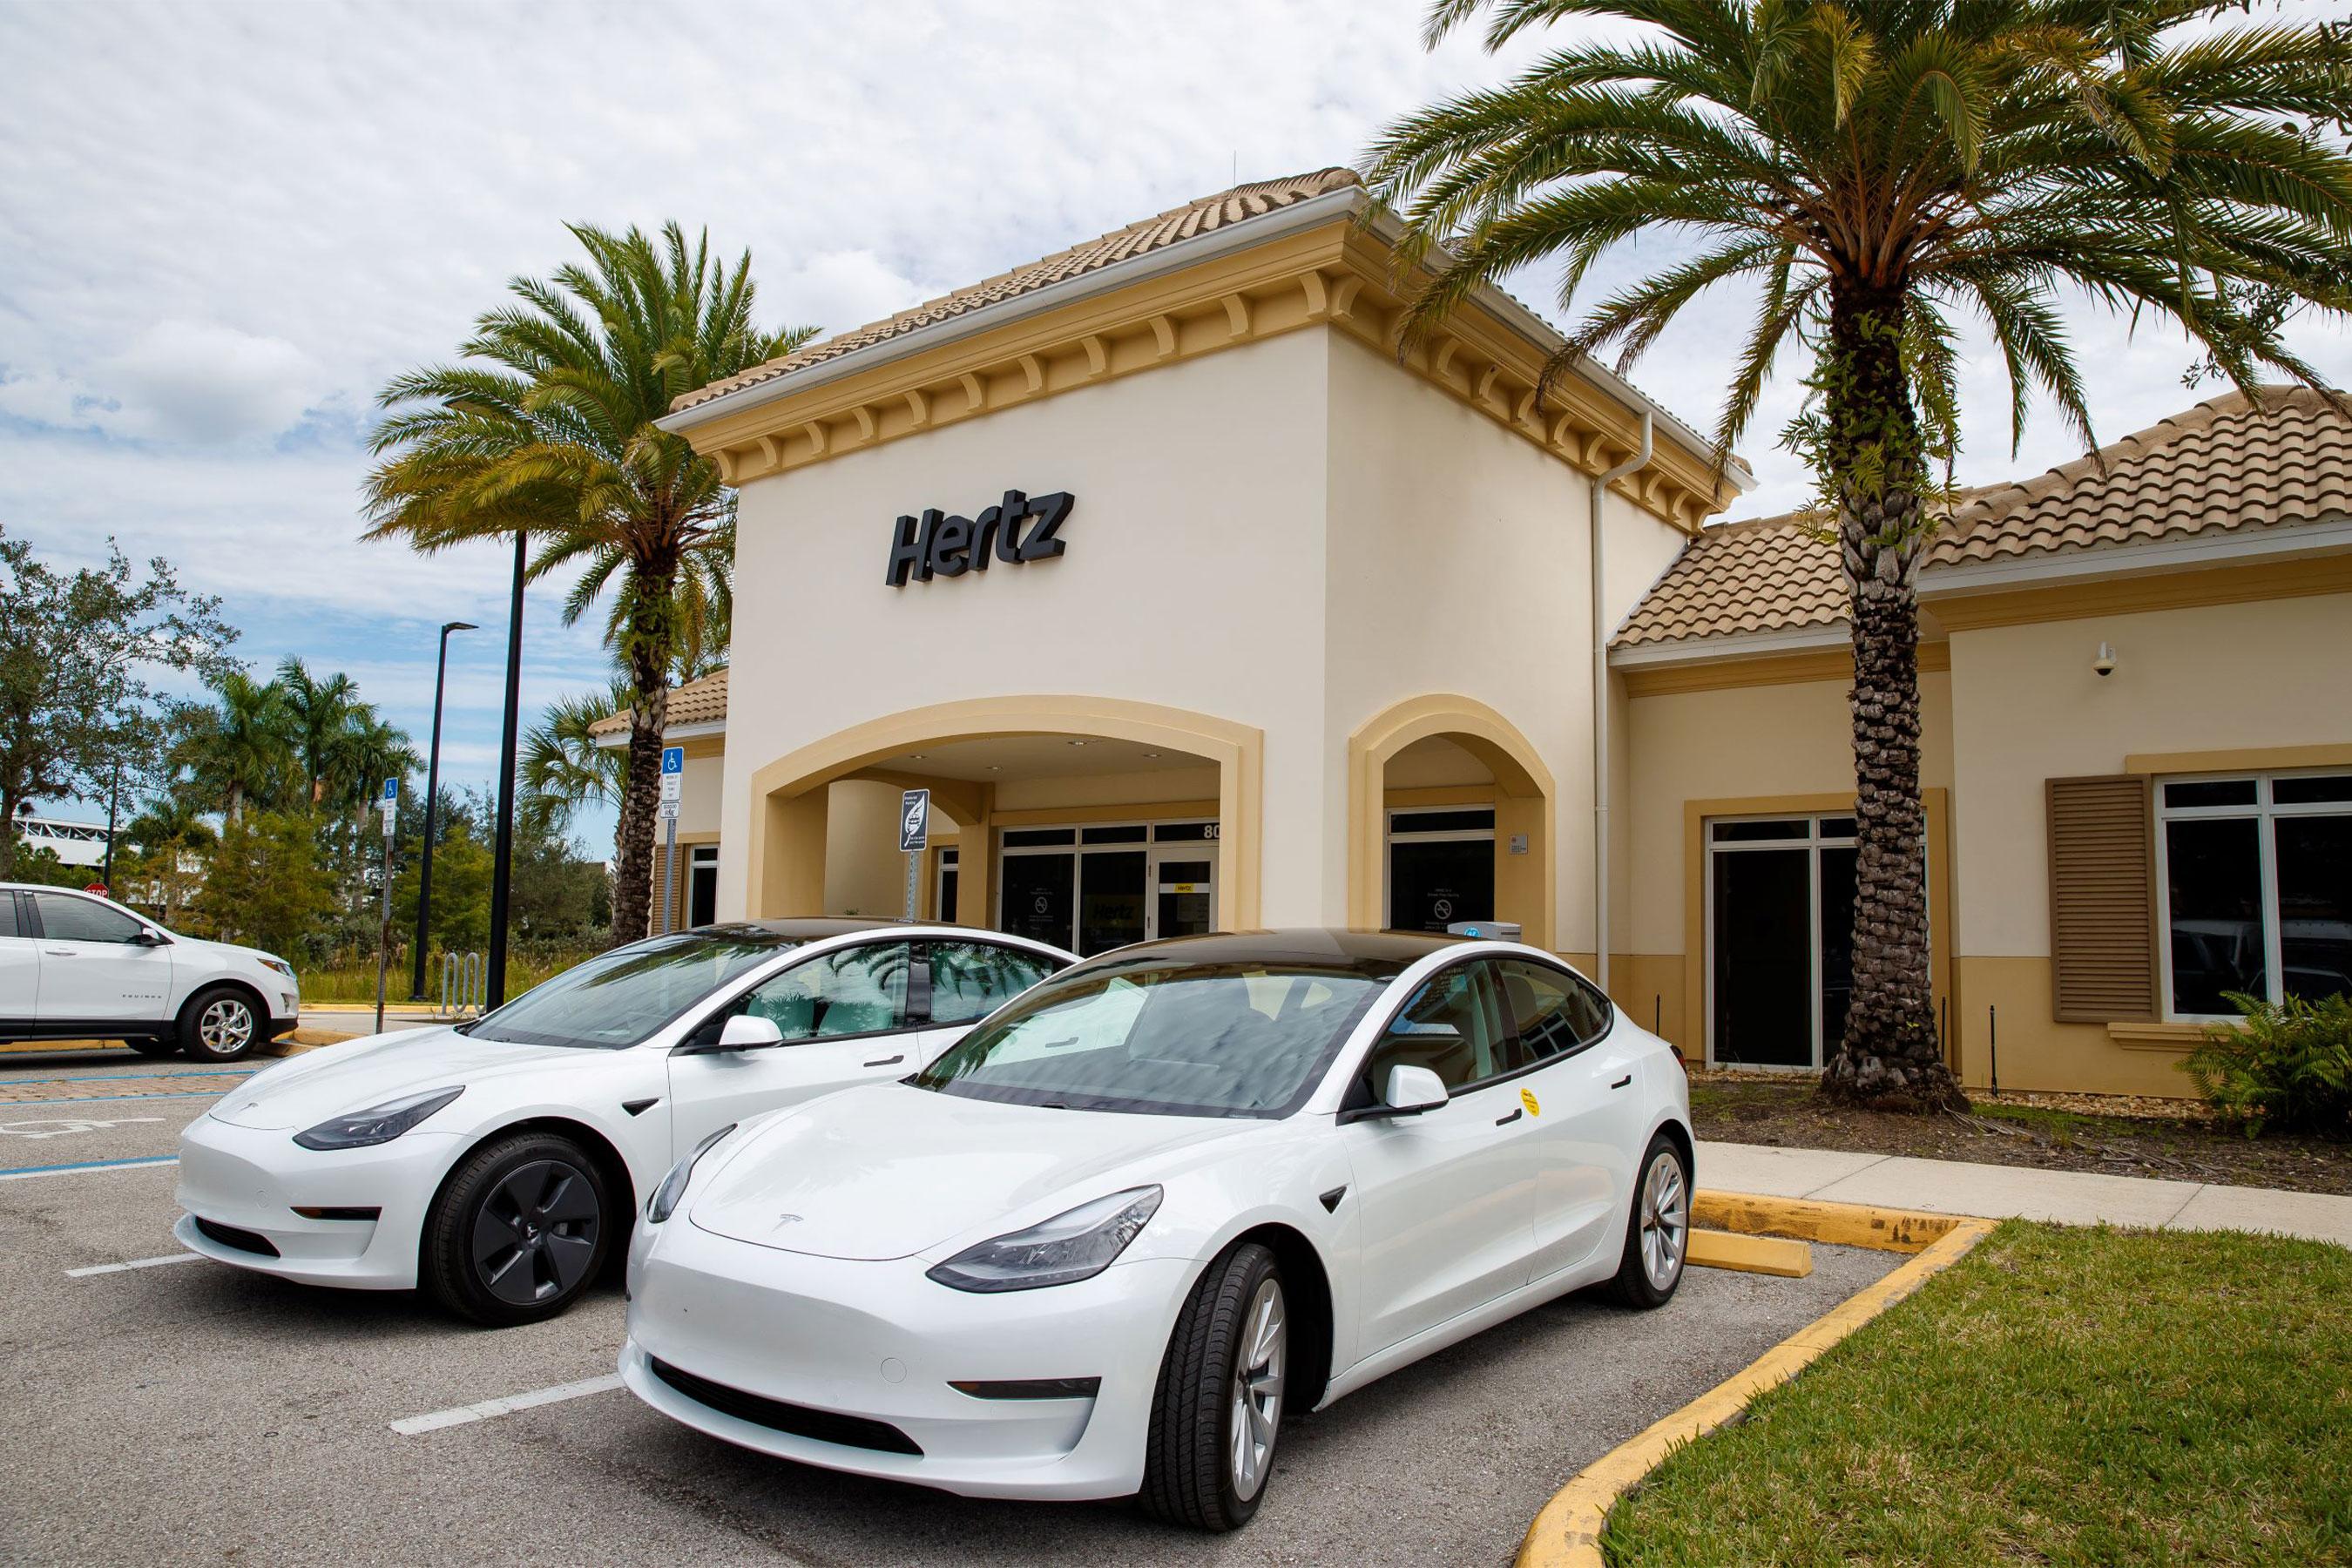 techcrunch.com - Aria Alamalhodaei - Tesla, Hertz shares rise following order for 100,000 EVs